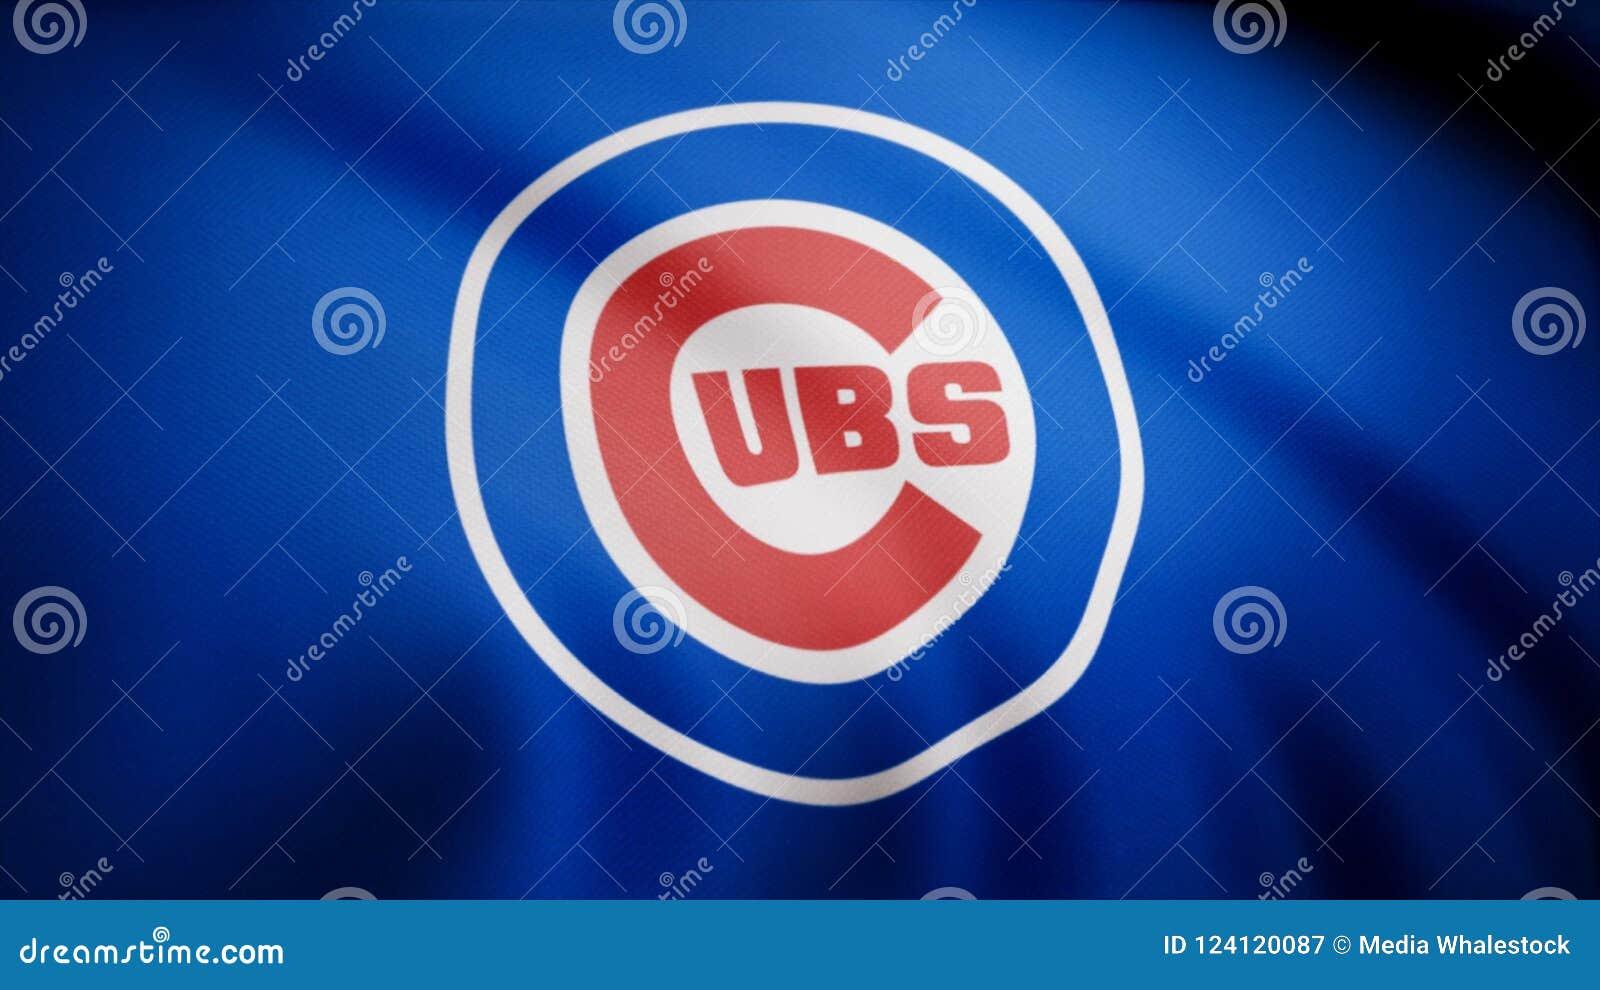 Bandiera di Chicago Cubs, squadra di baseball professionale americana Logo del gruppo di Chicago Cubs di baseball, ciclo senza cu